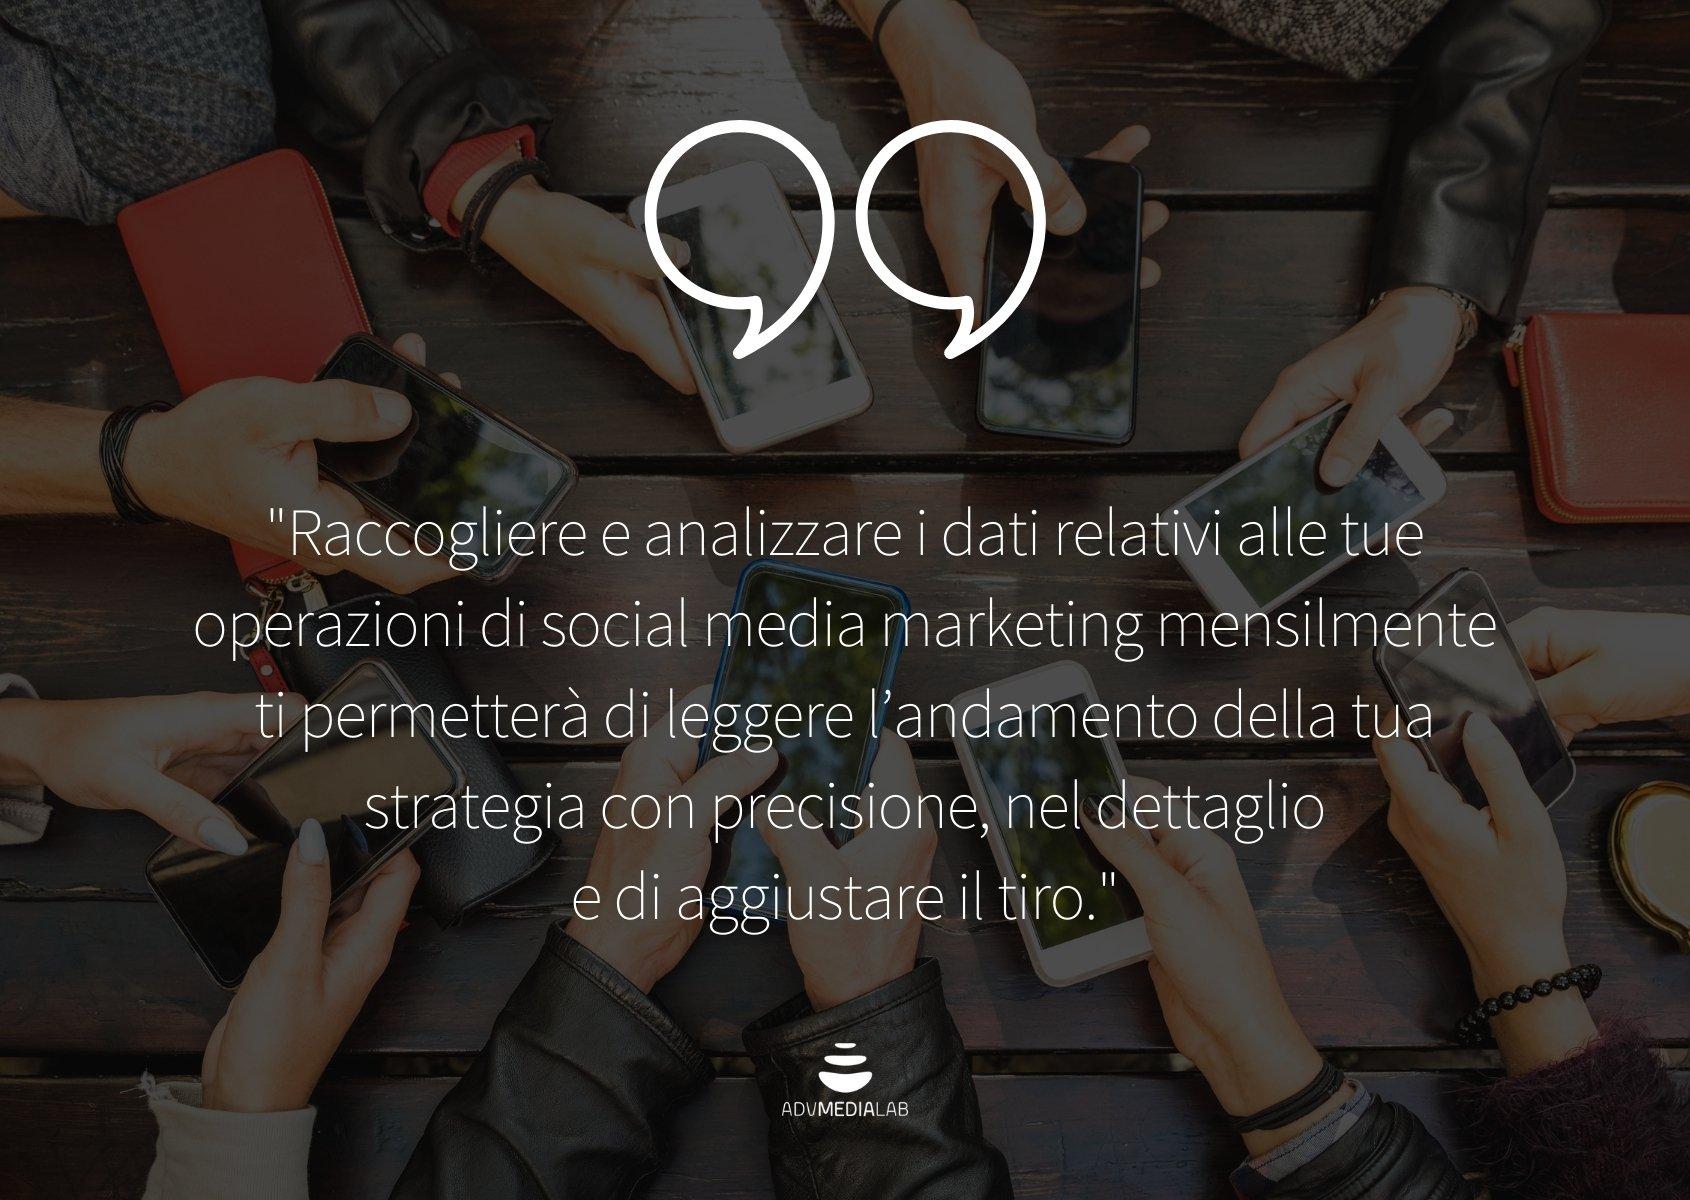 Blog-post-SOCIAL-MEDIA-CHECKLIST-2021-quote3